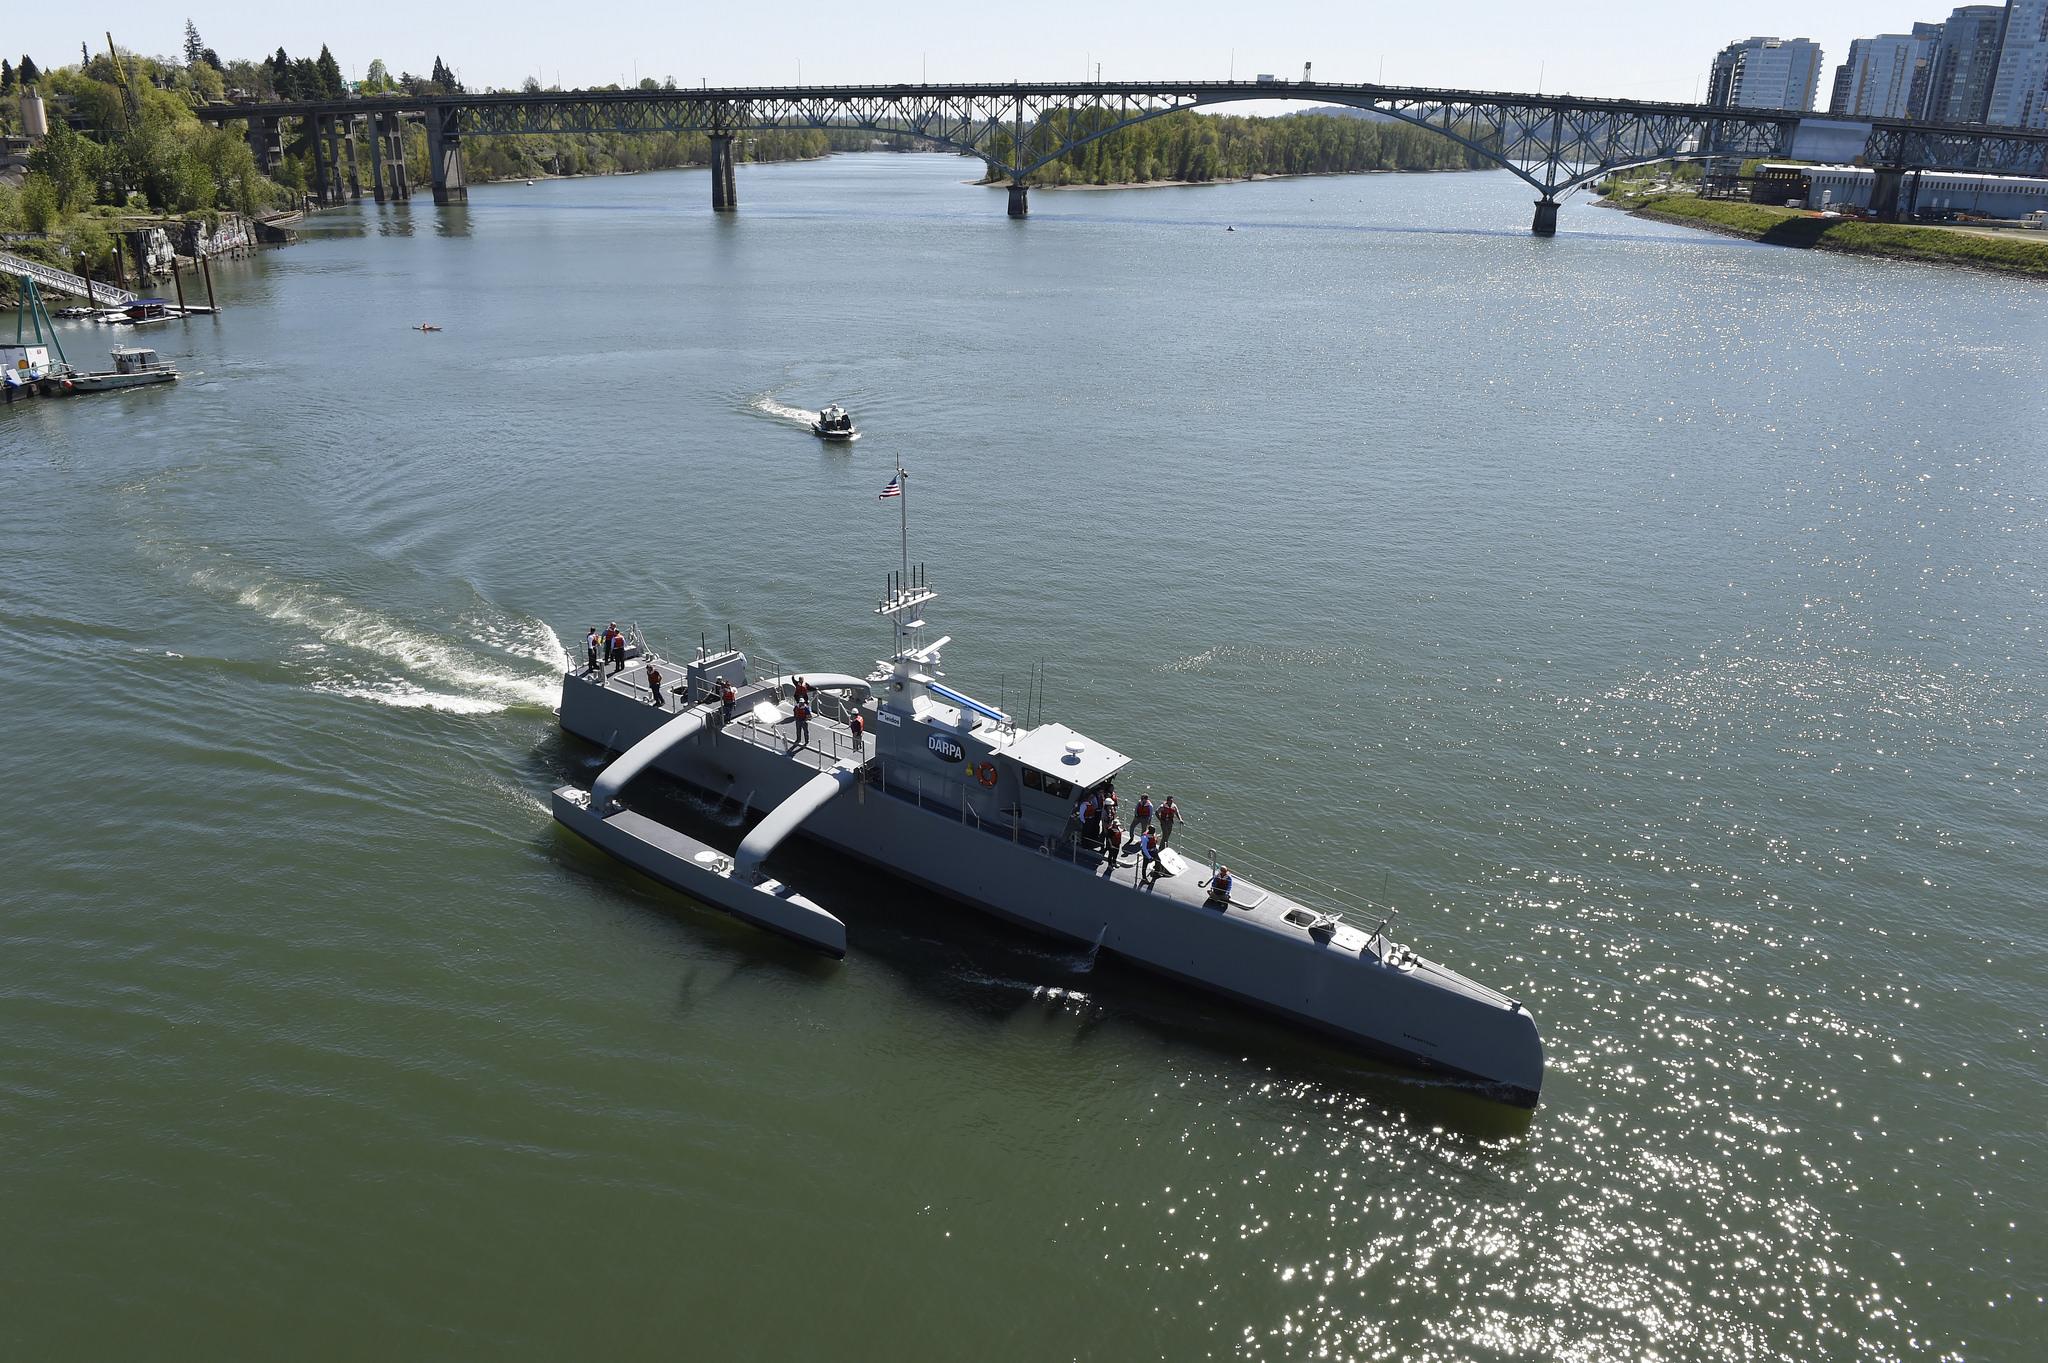 The Sea Hunter makes a turn on the Willamette River in Portland, Ore.